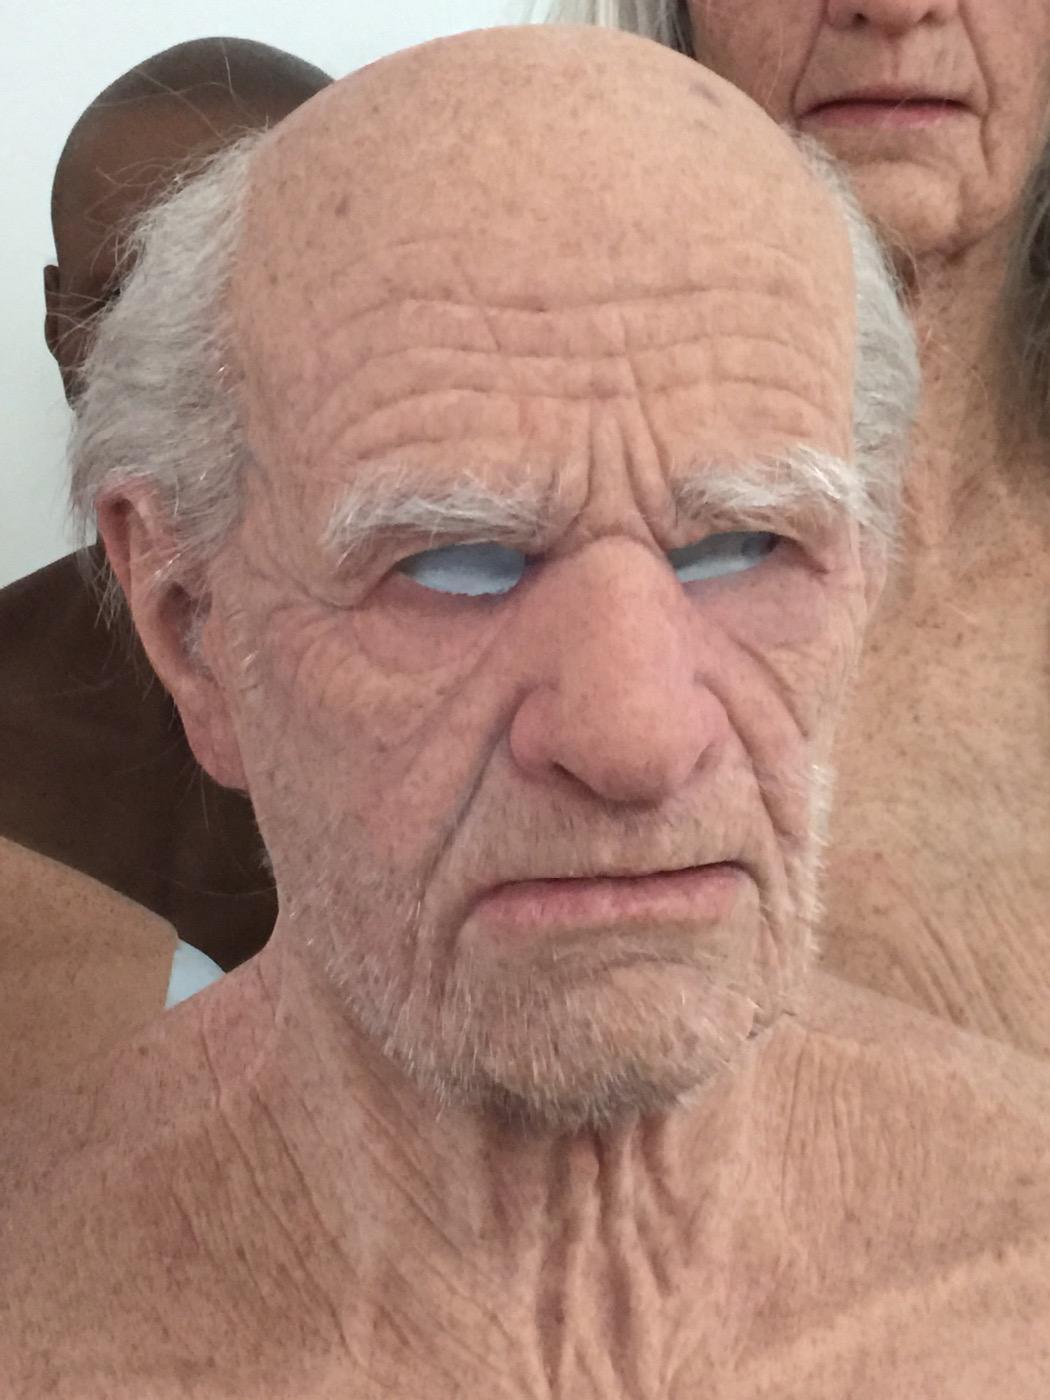 REALFLESH MASKS on Twitter: Realflesh Masks the sugar